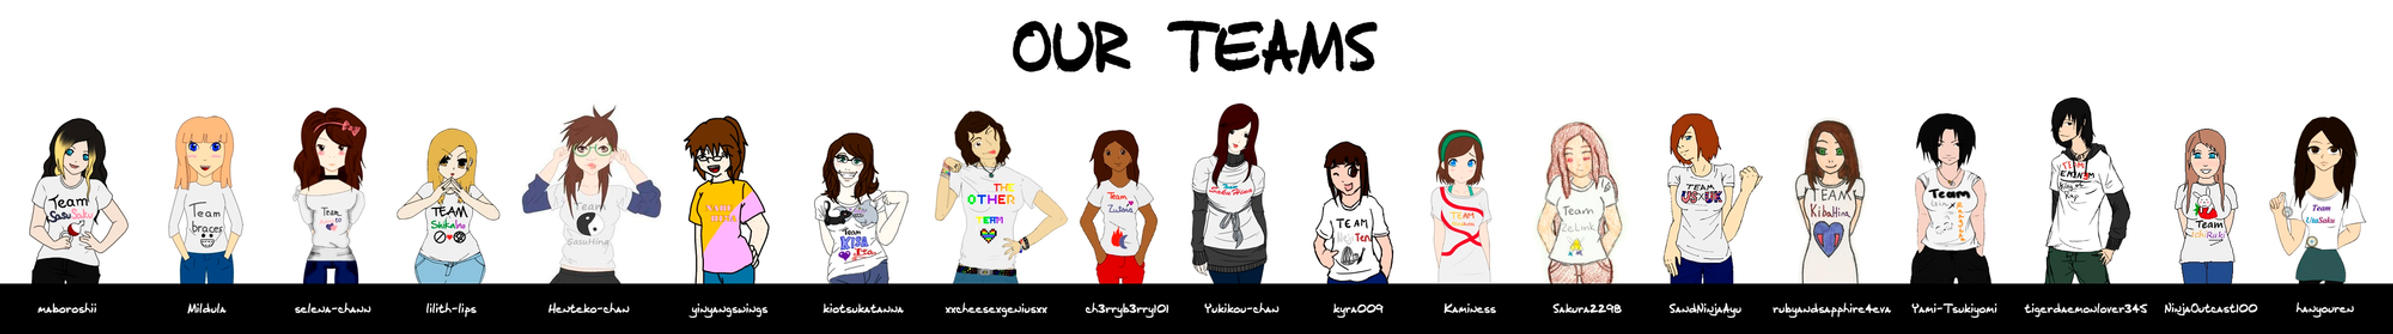 Team Collaboration Intro by rubyandsapphire4eva